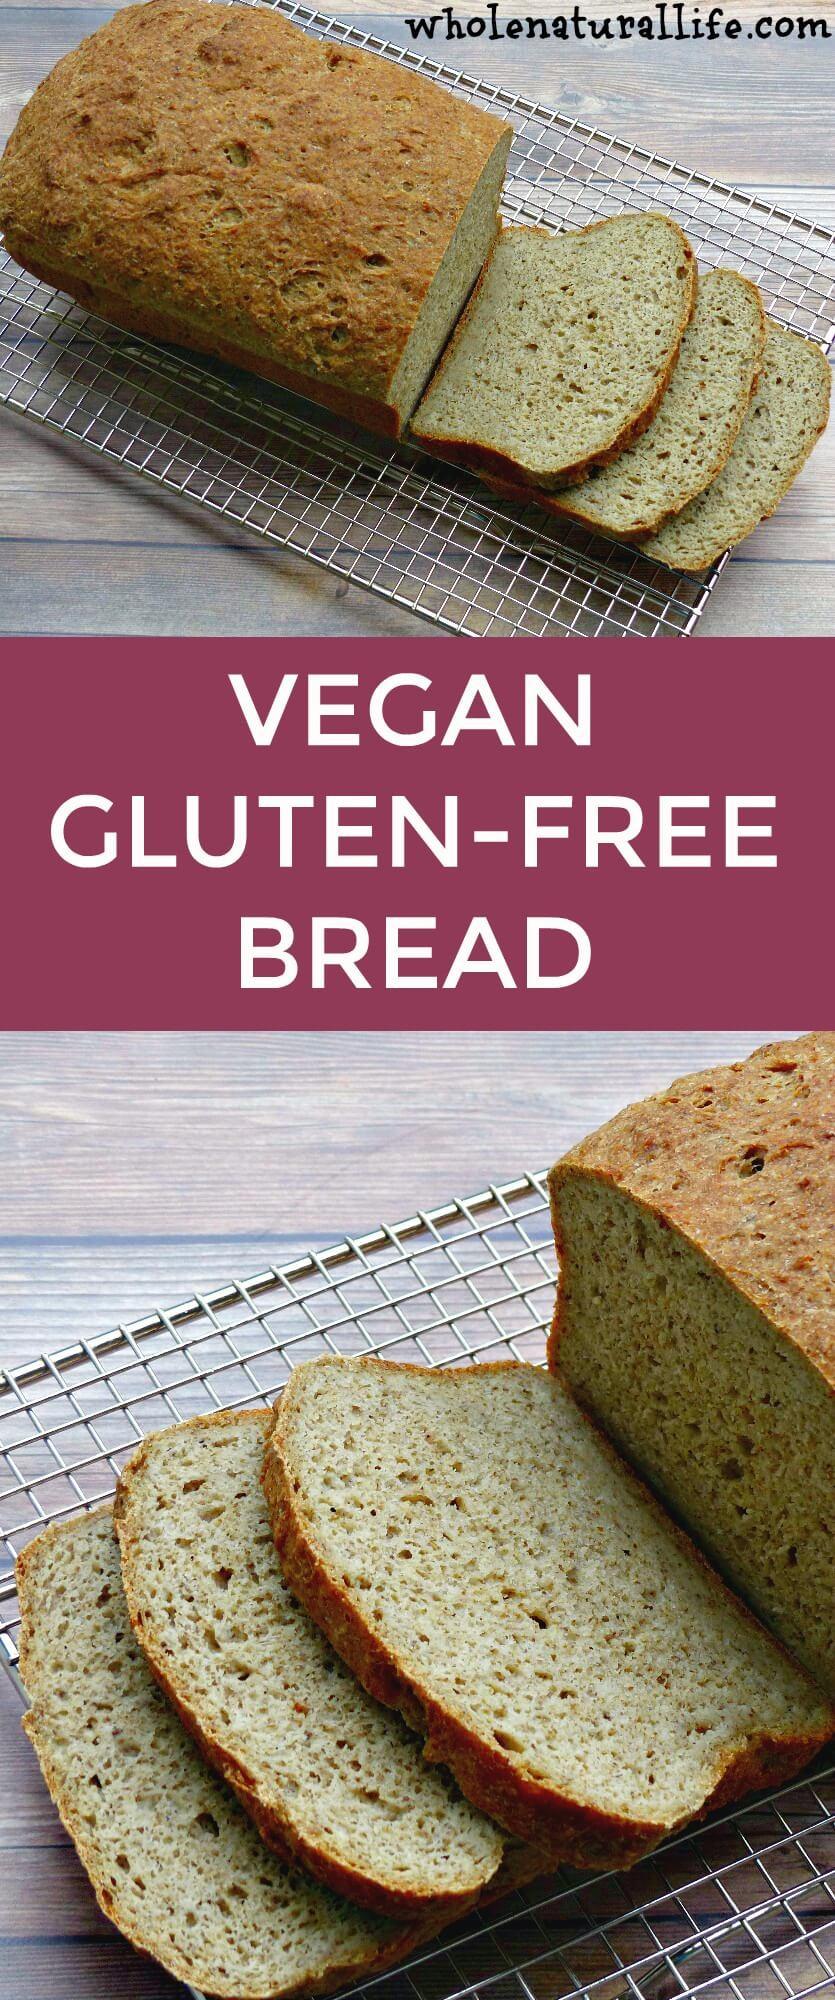 Gluten Free Dairy Free Bread  Vegan Gluten free Bread Whole Natural Life